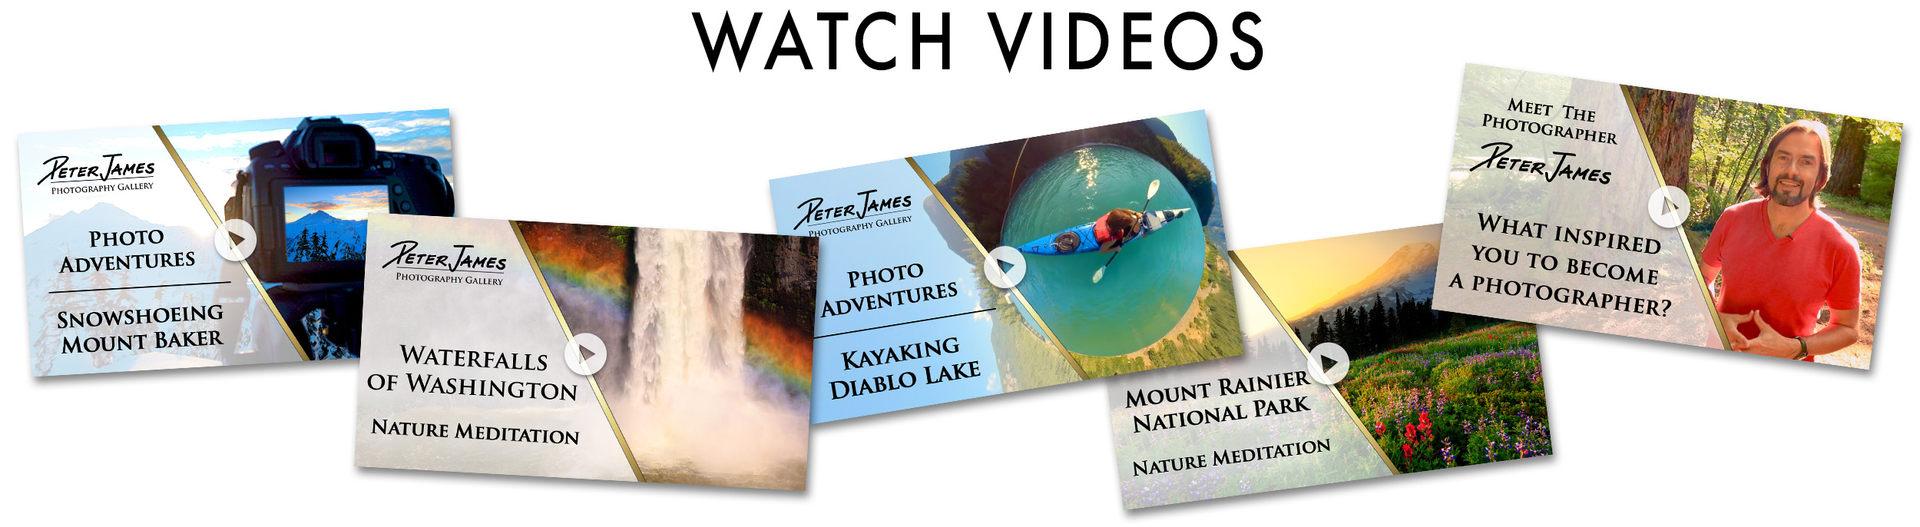 Videos.jpg